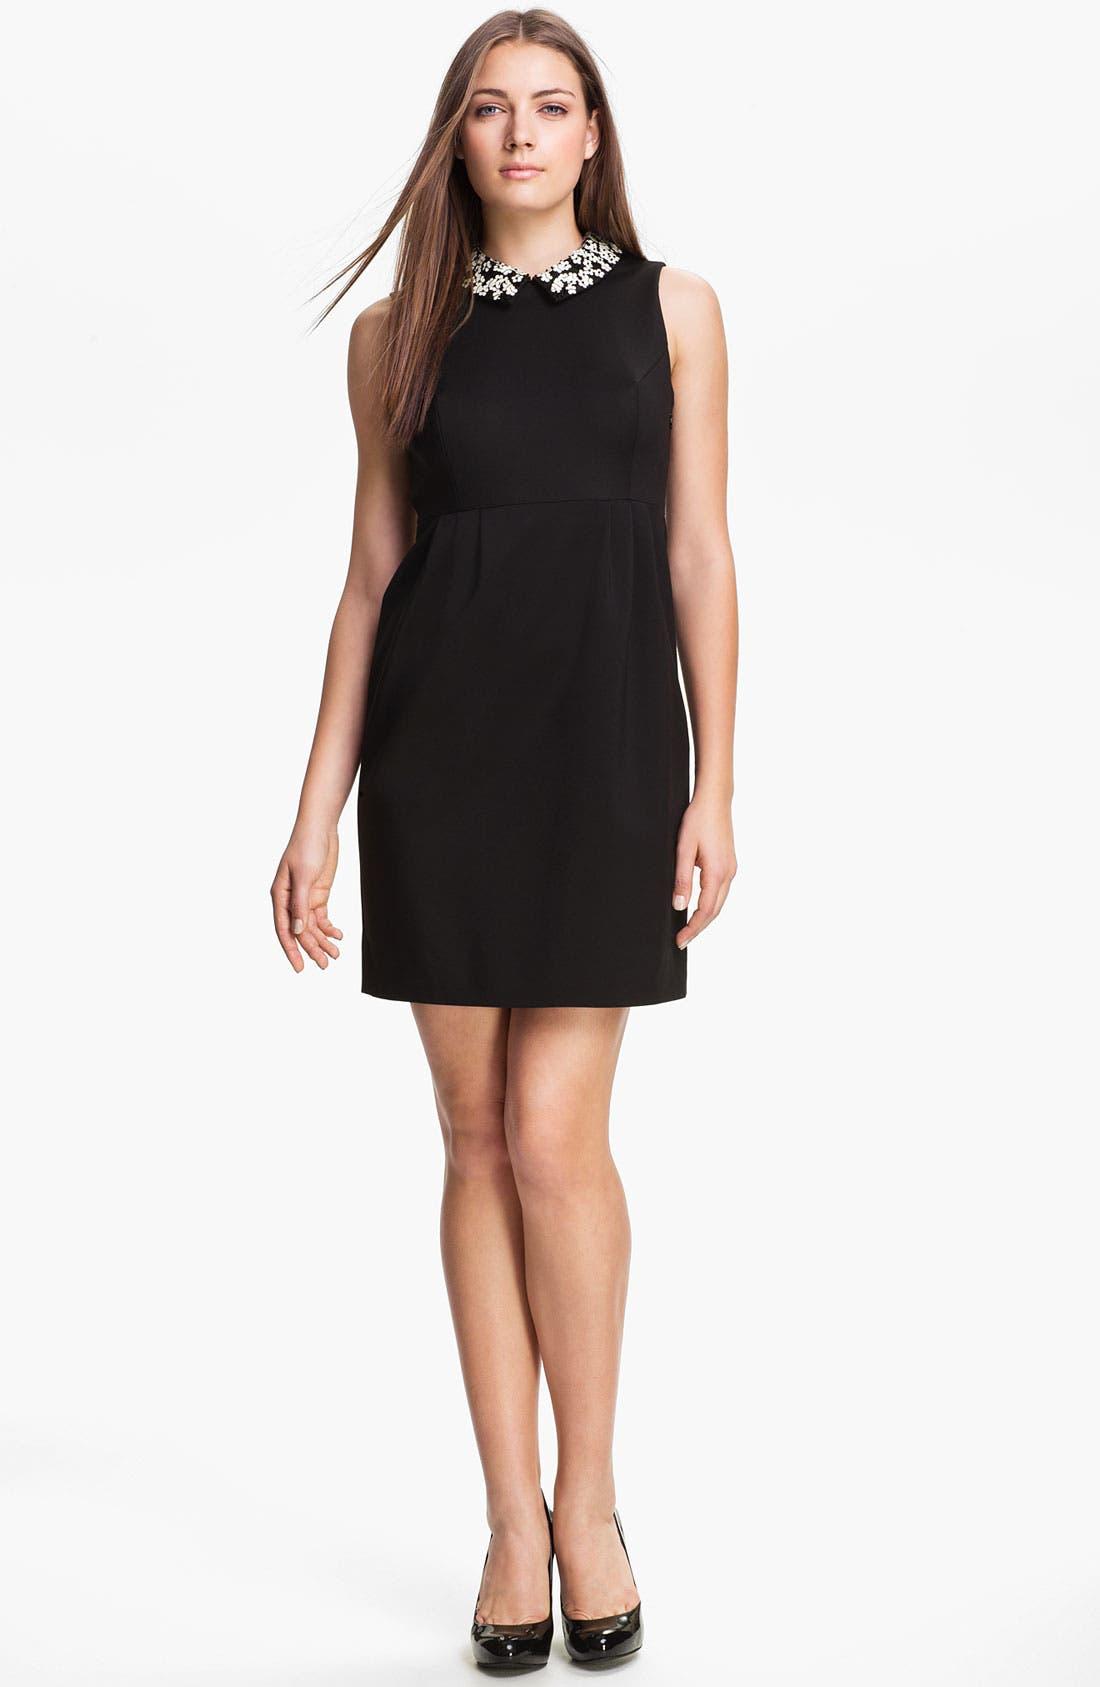 Alternate Image 1 Selected - kate spade new york 'bradie' cotton blend shift dress